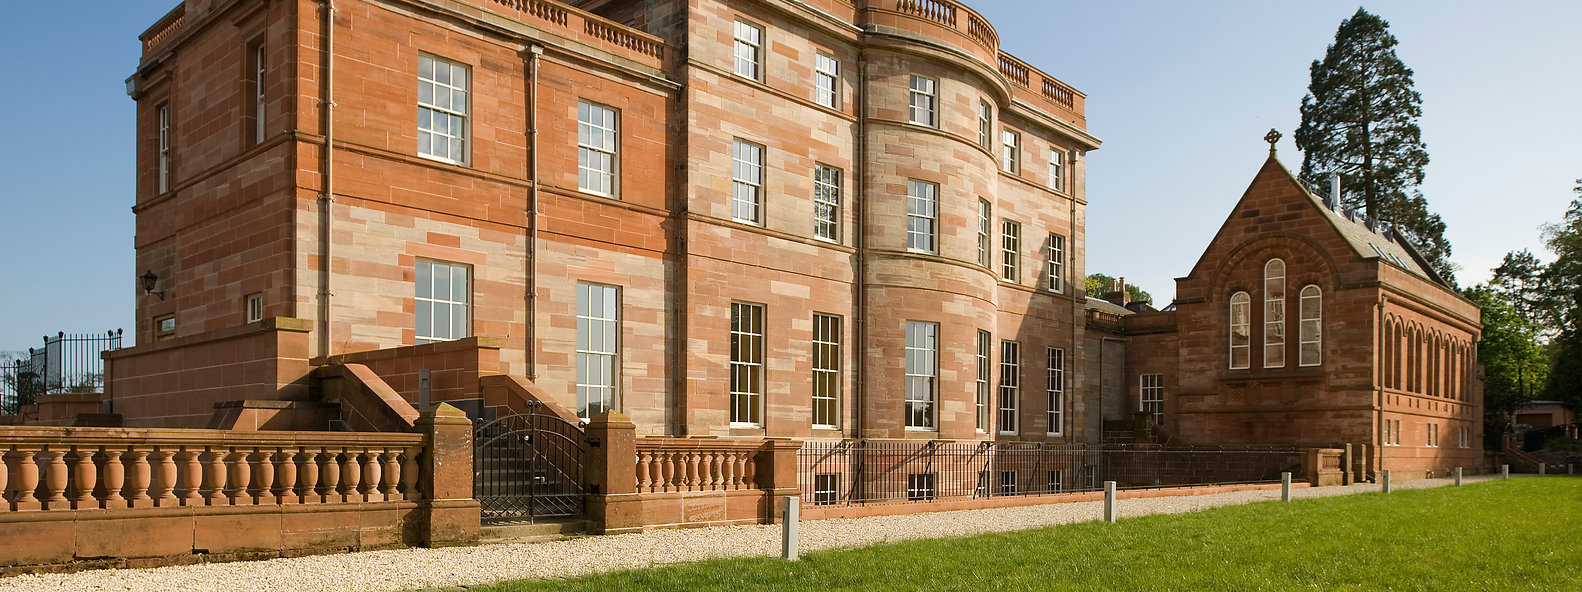 Scottish UK Architects ICDP coodham restoration conservation arhcitecture design red sandstone